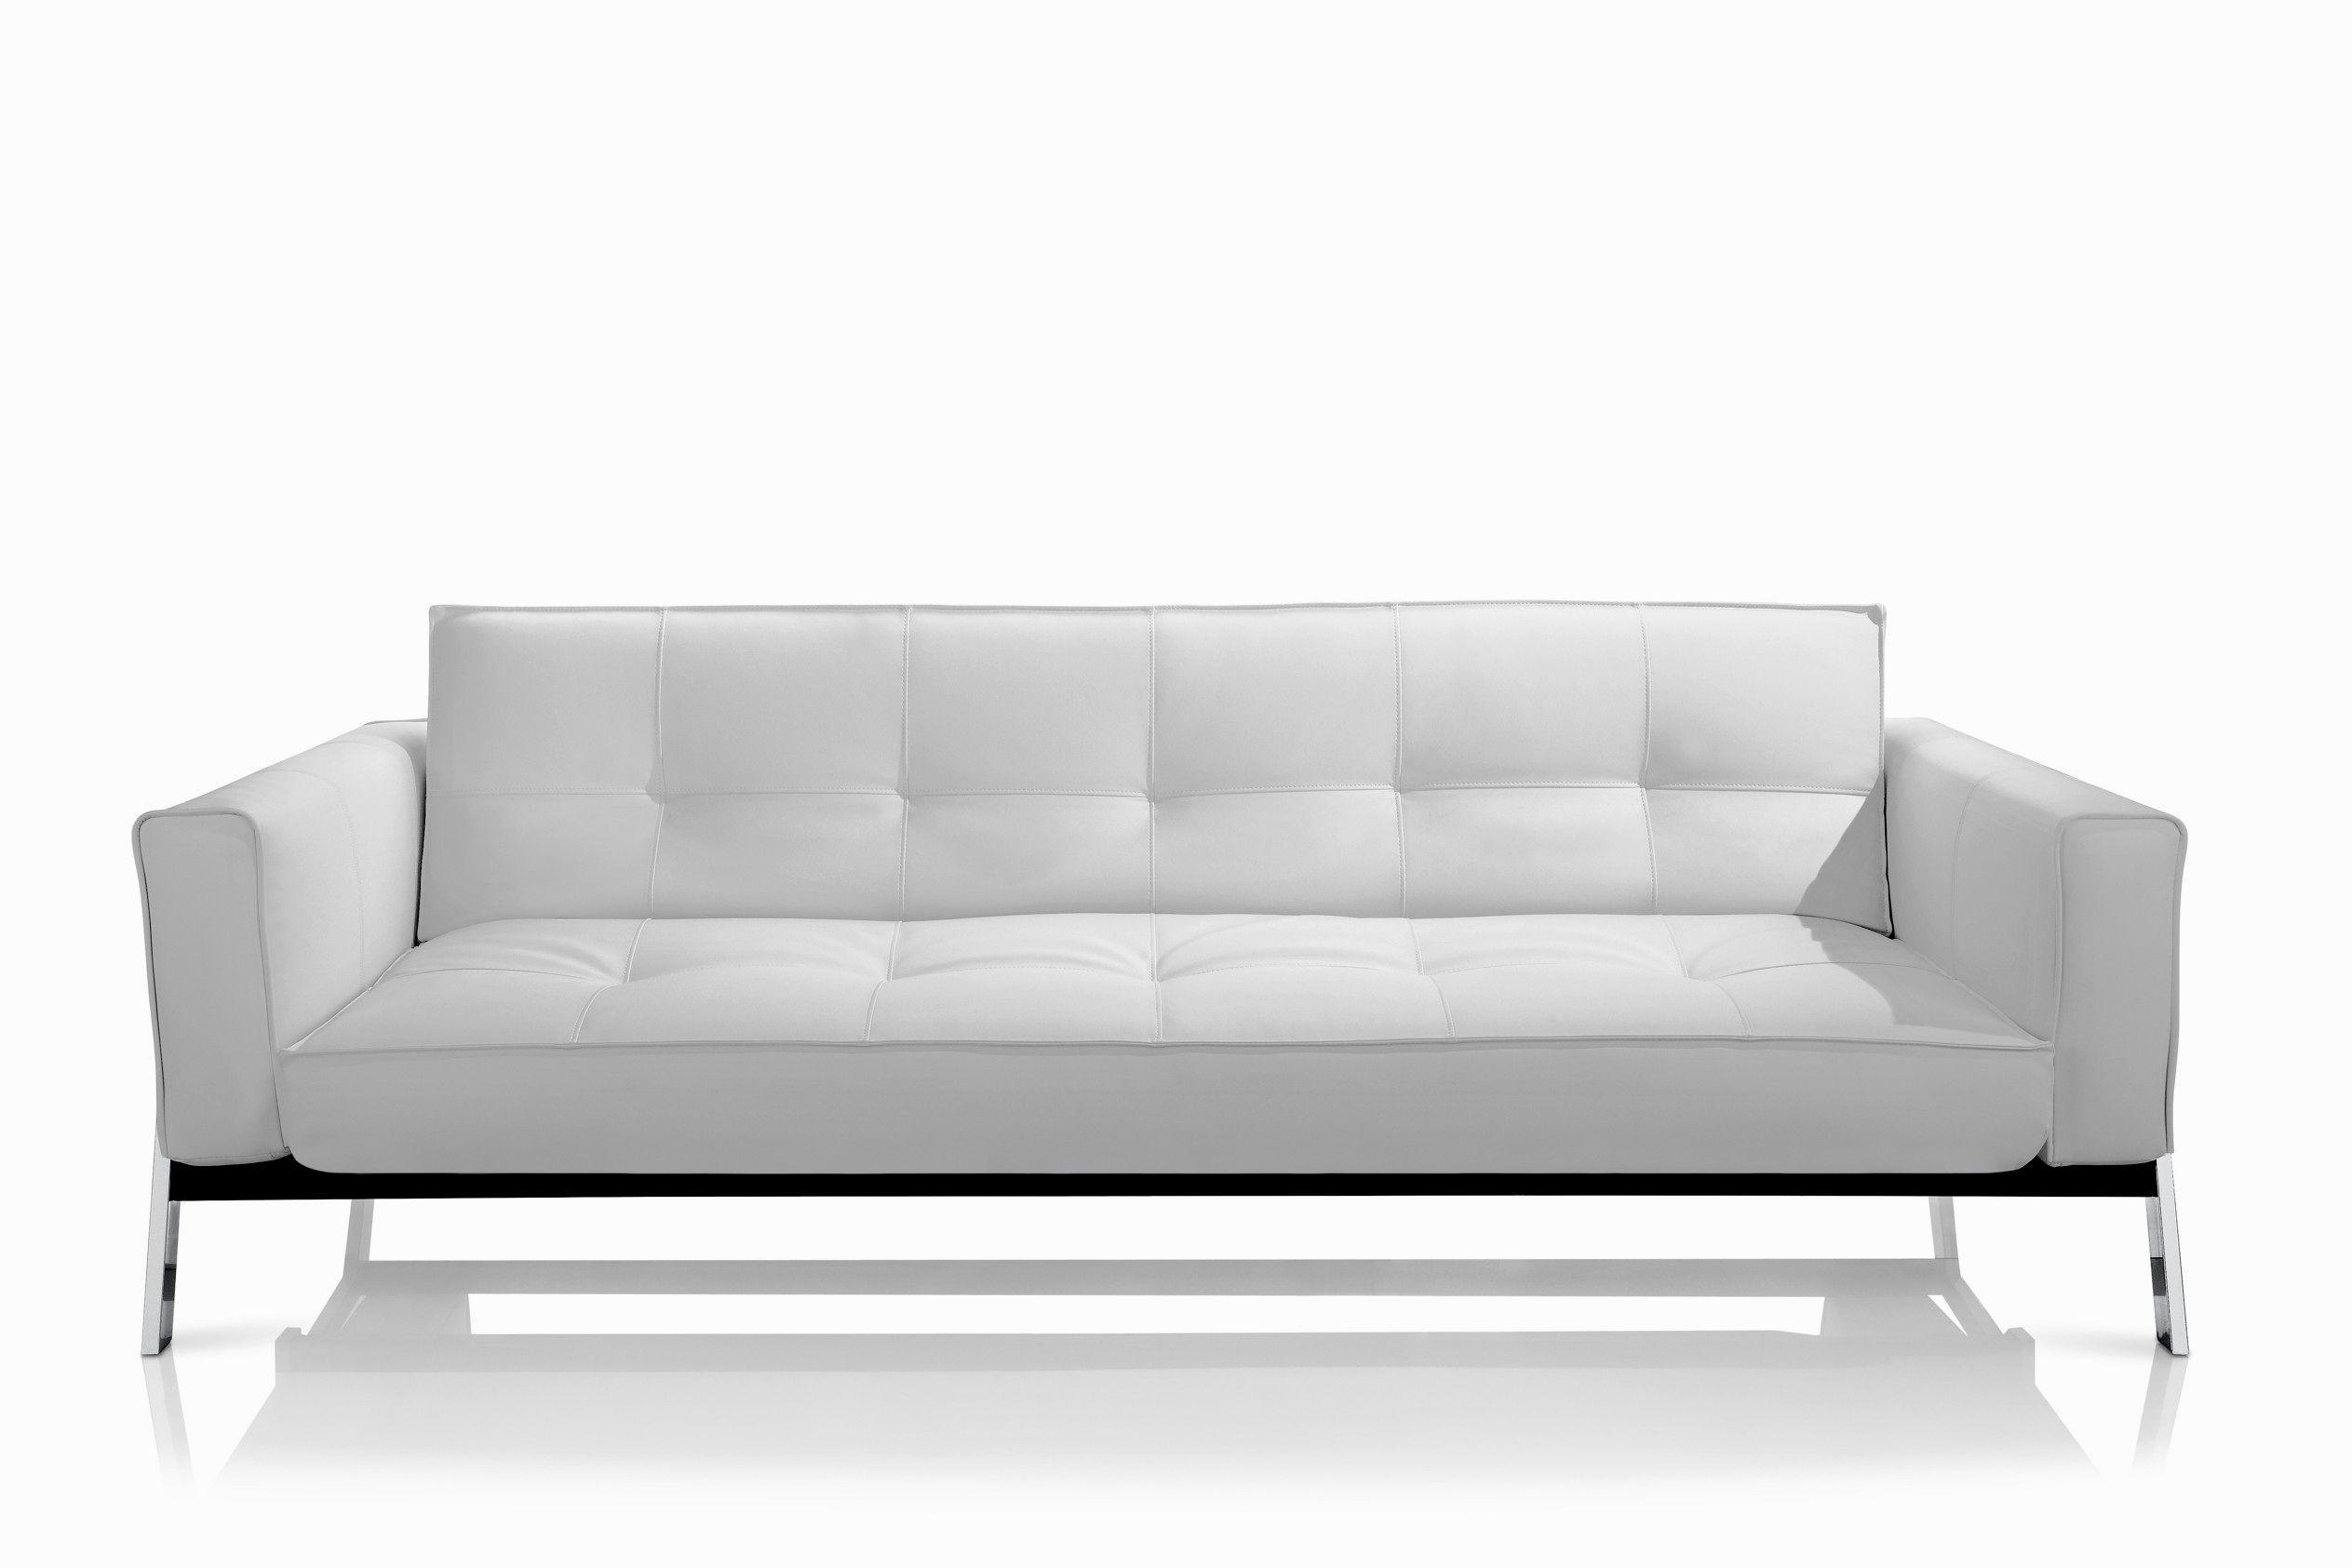 Long Modern Sofa Long Sofa Alluring Cravt Original Nexus Model Max With Regard To Long Modern Sofas (Image 11 of 20)